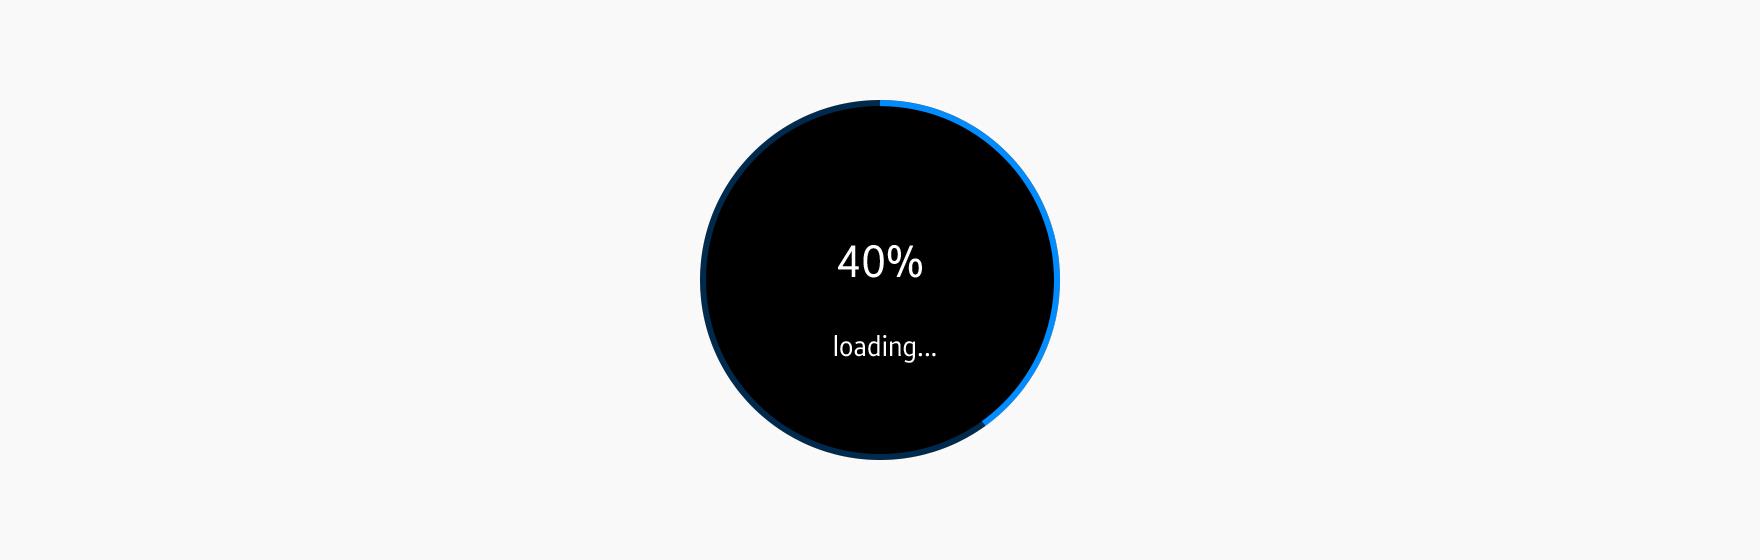 A full progress indicator shows progress around the edge of the screen.